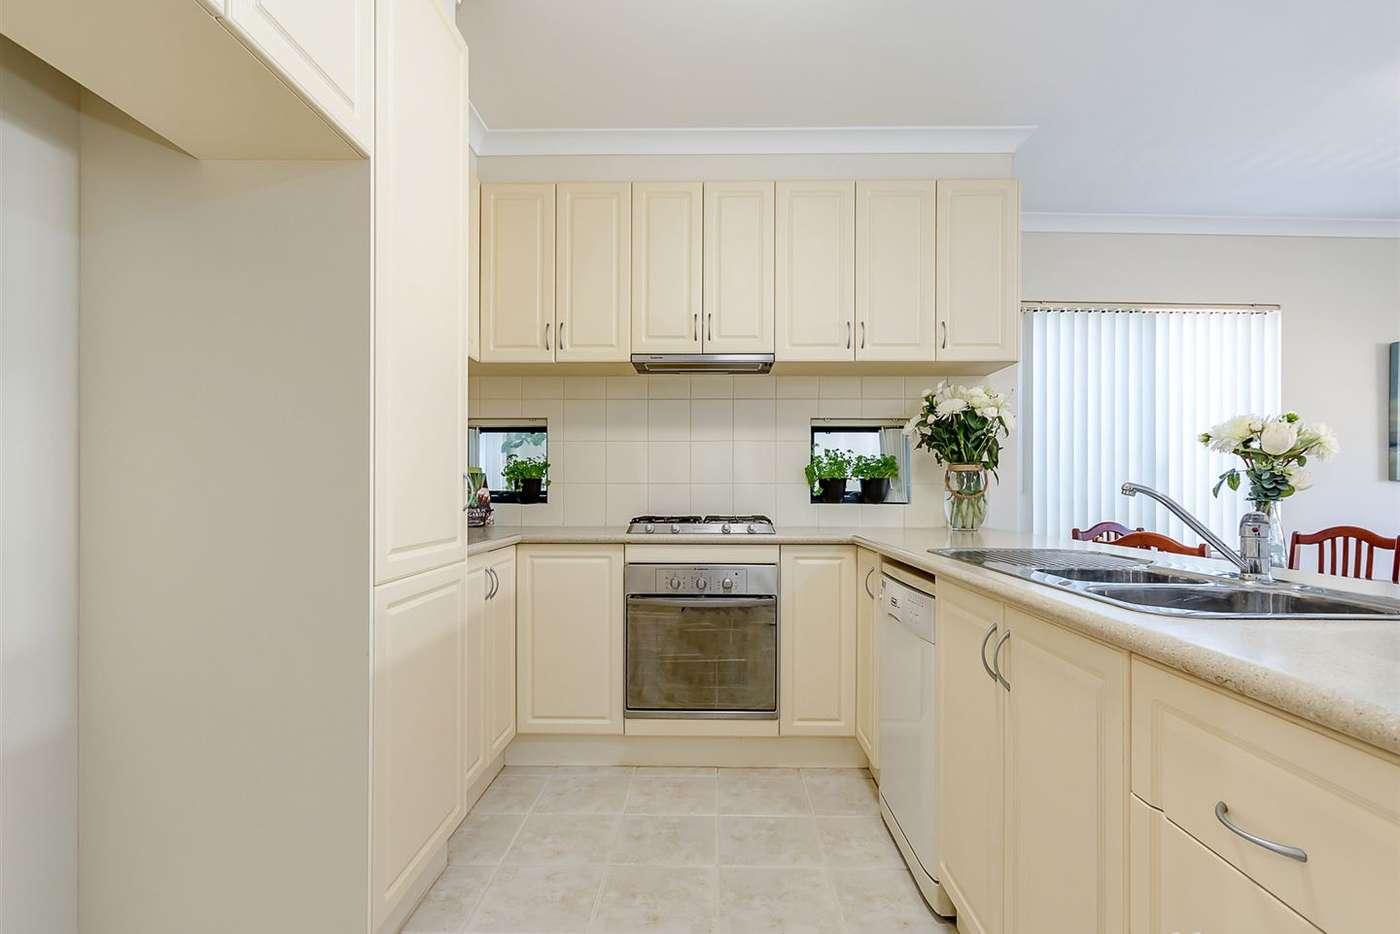 Sixth view of Homely unit listing, 5/157 Kinross Drive, Kinross WA 6028